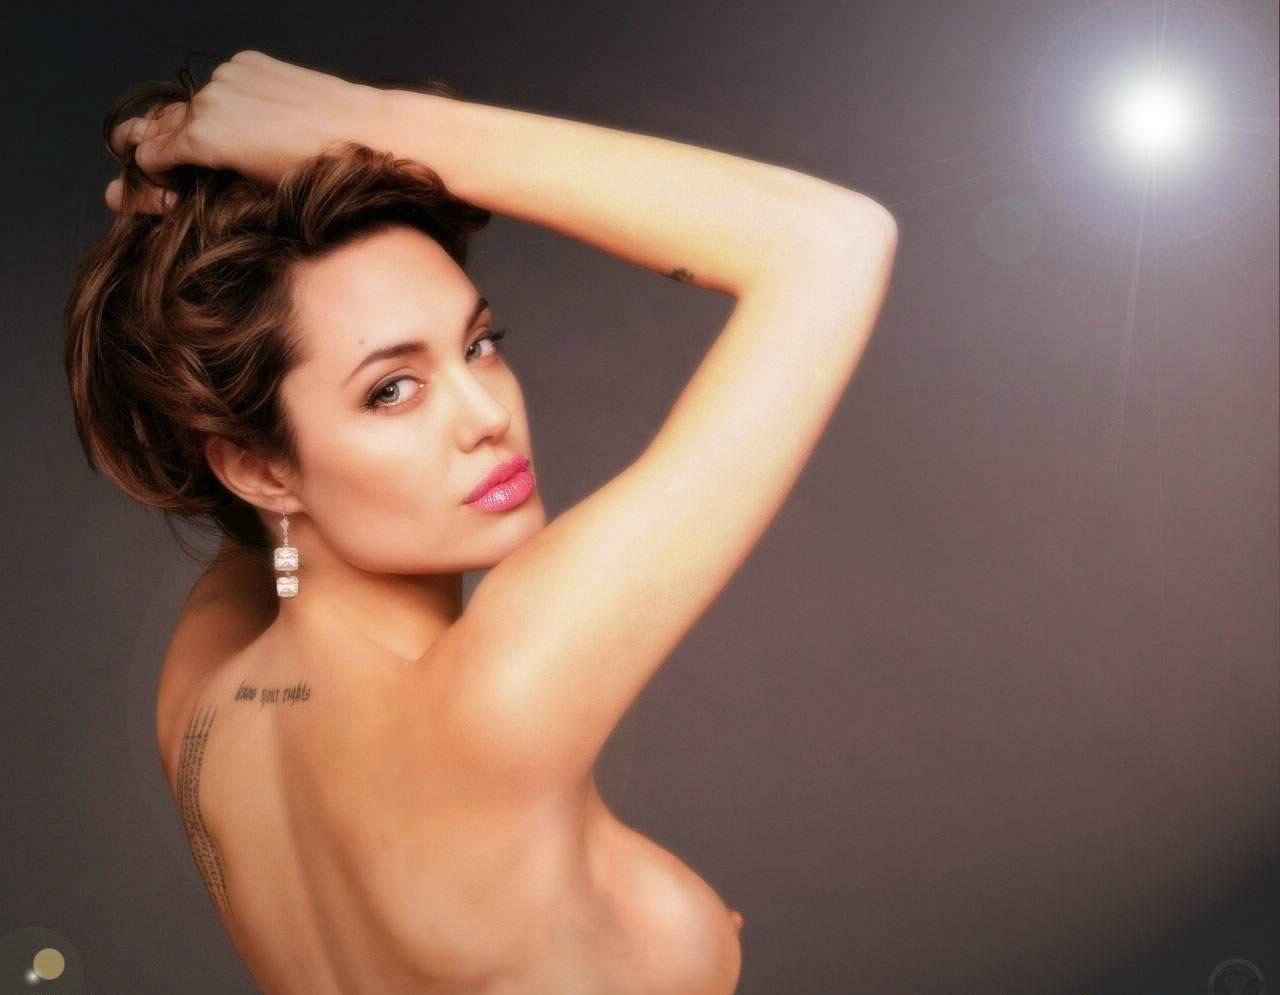 Angelina Jersey Shore Nude angelina pivarnick nude pics - megapornx